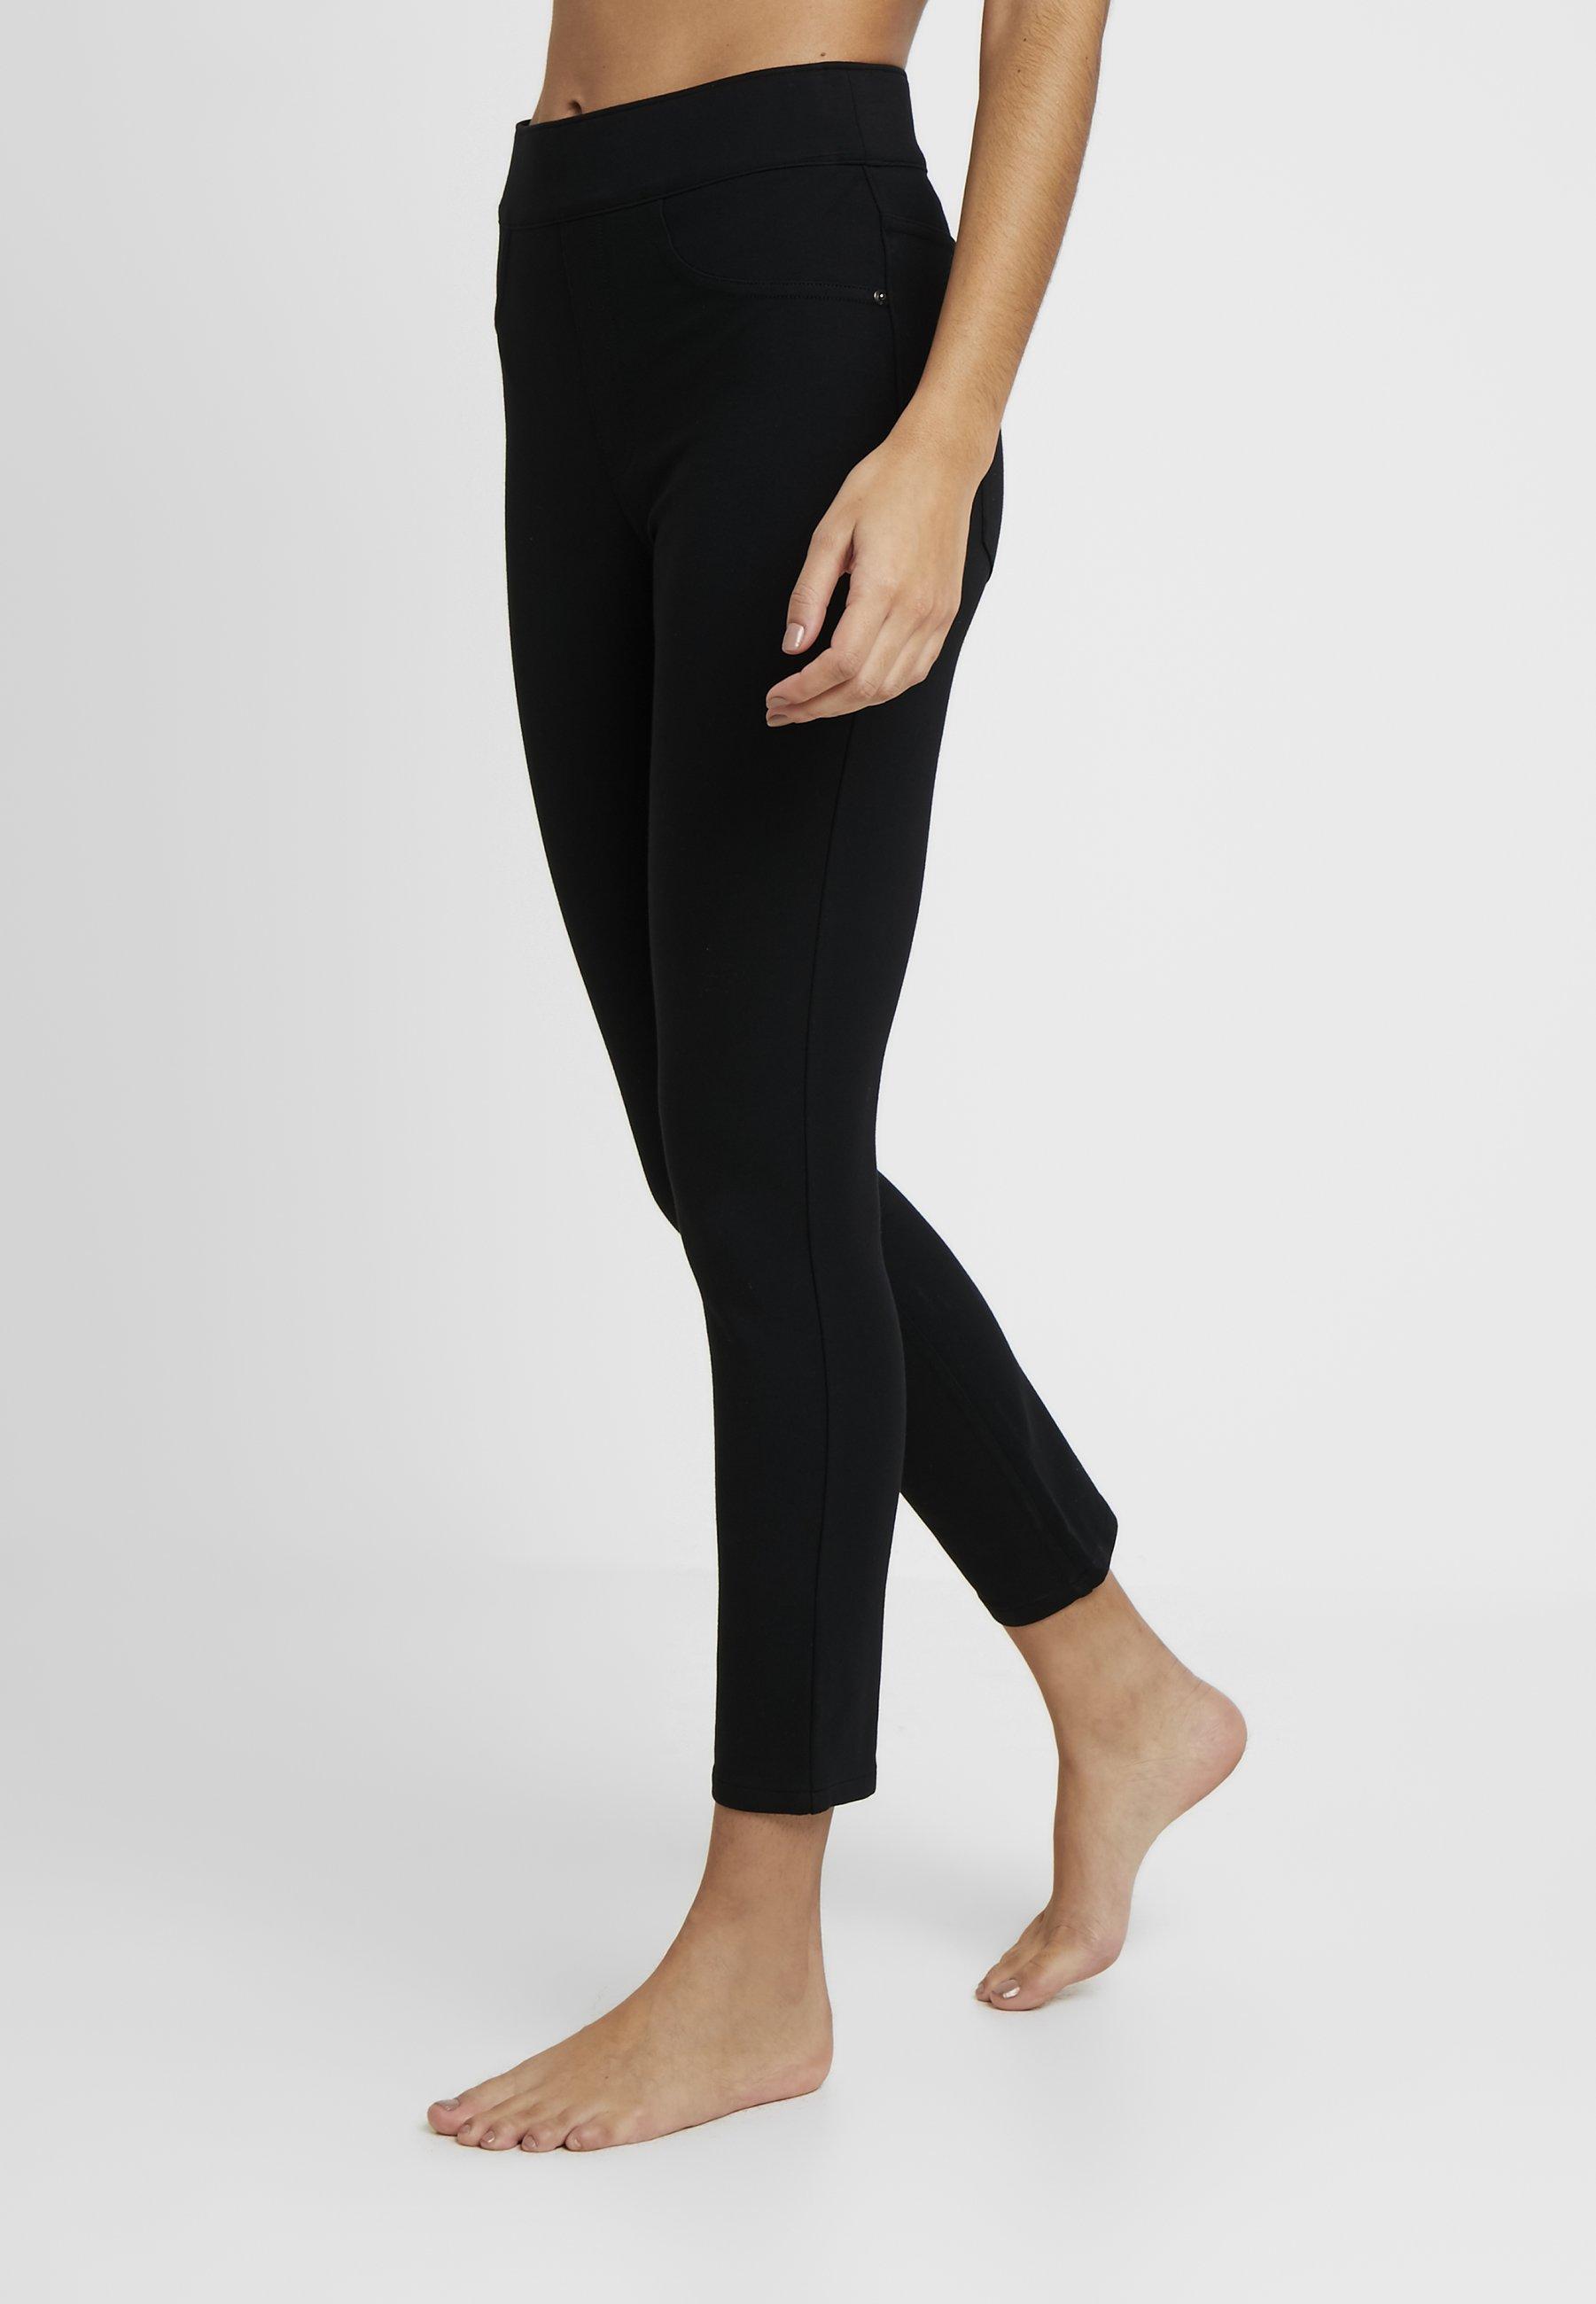 Women PONTE - Leggings - Stockings